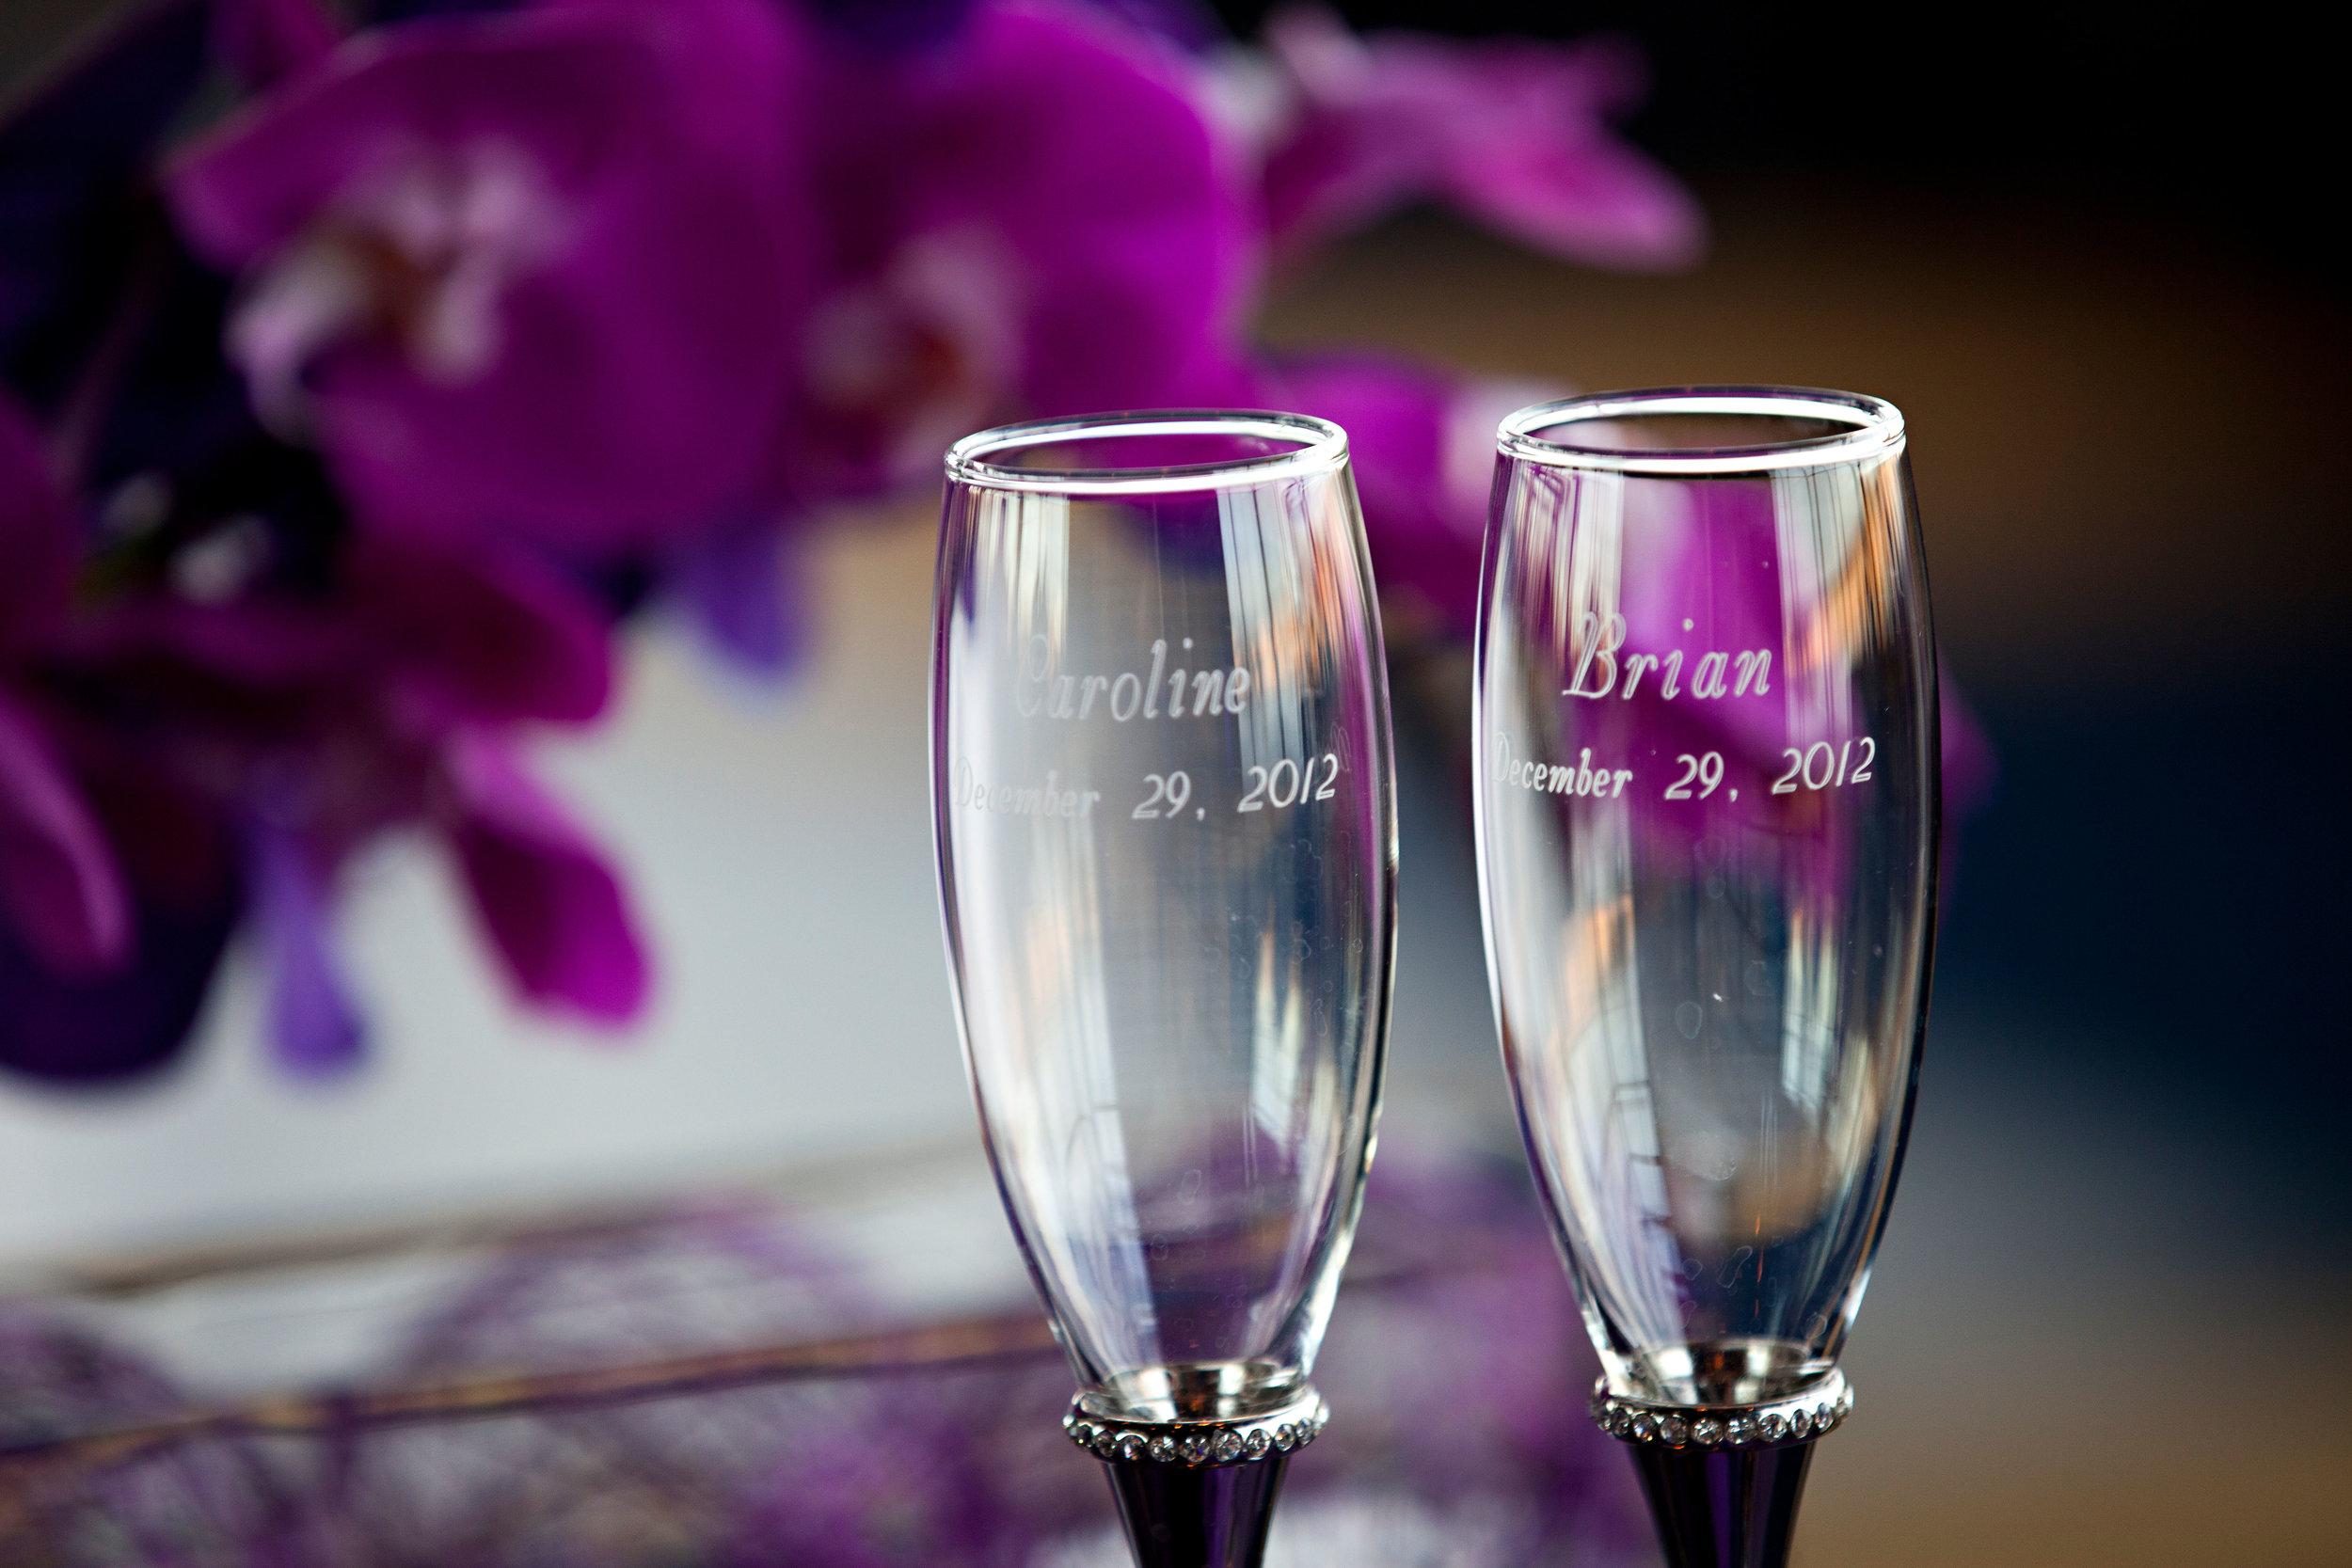 20 custom bride and groom glasses custom toasting glasses O Grace Photography Life Design Events.jpg